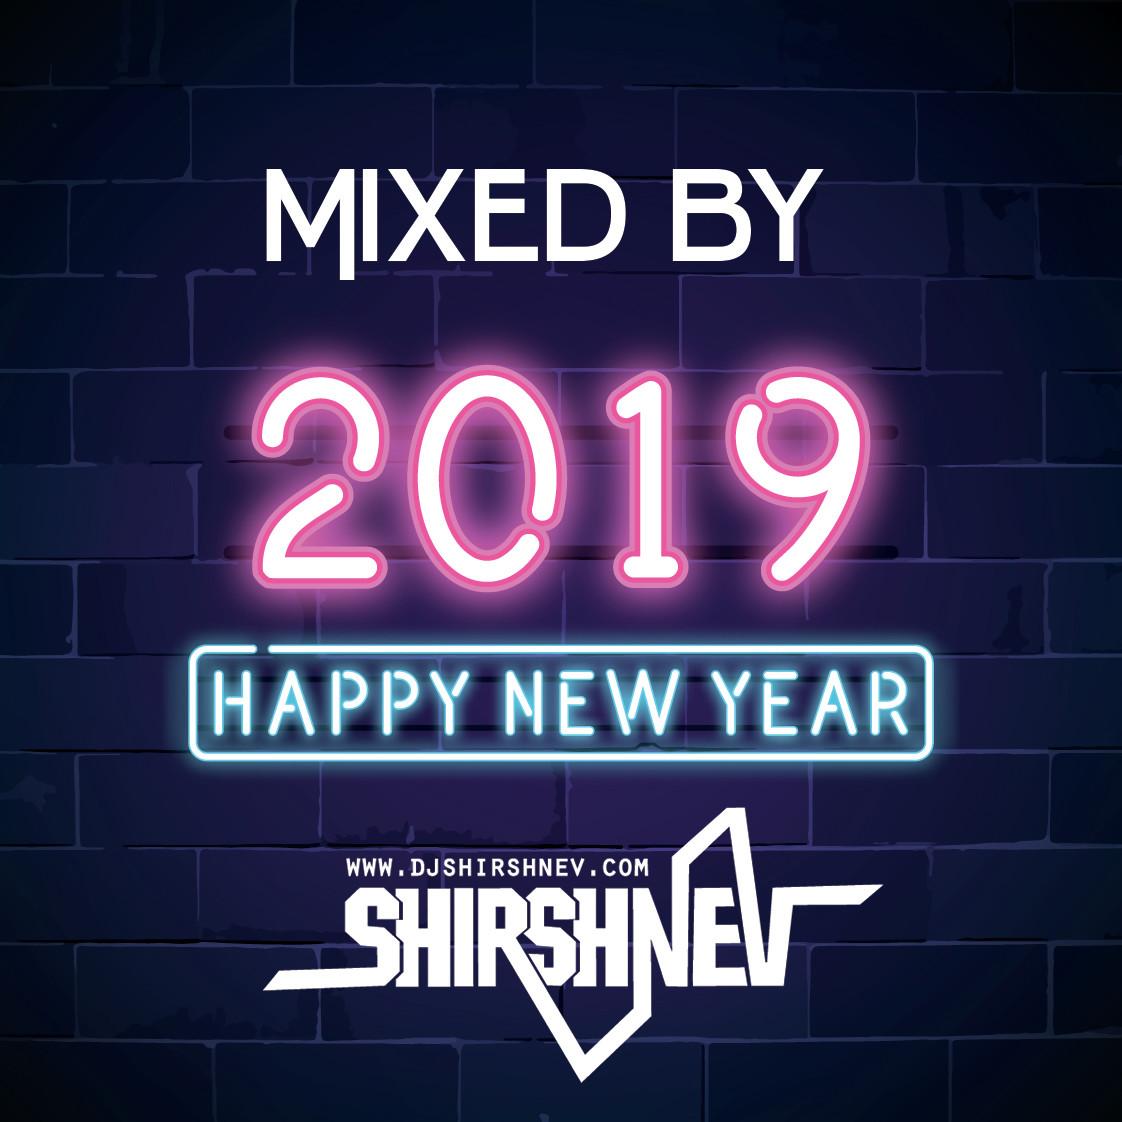 Hny 2019: HNY 2019 Mixed By Shirshnev